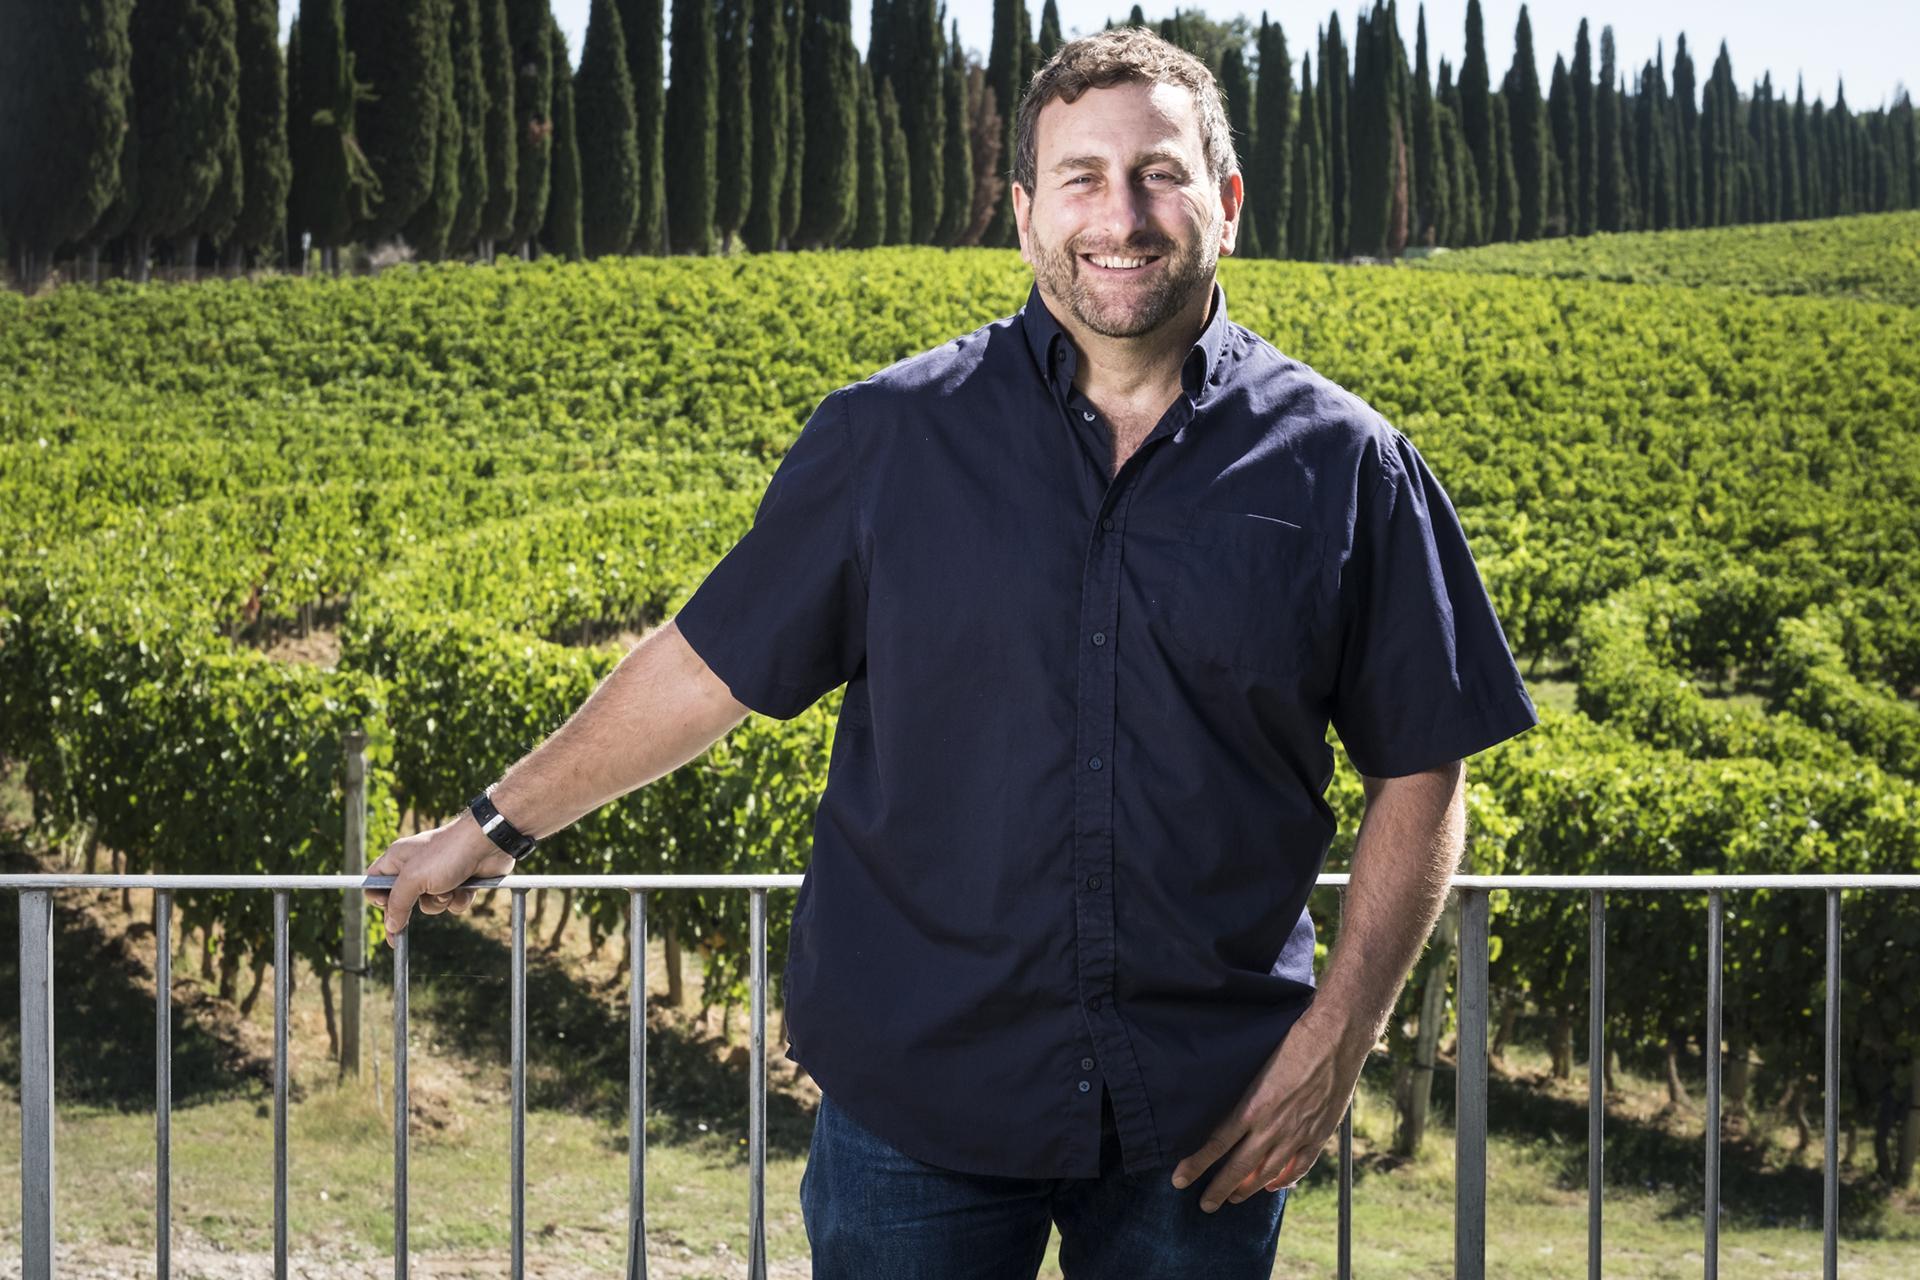 Lawrence Cronin, winemaker for the Tenuta di Arceno Estate in Tuscany, Italy.